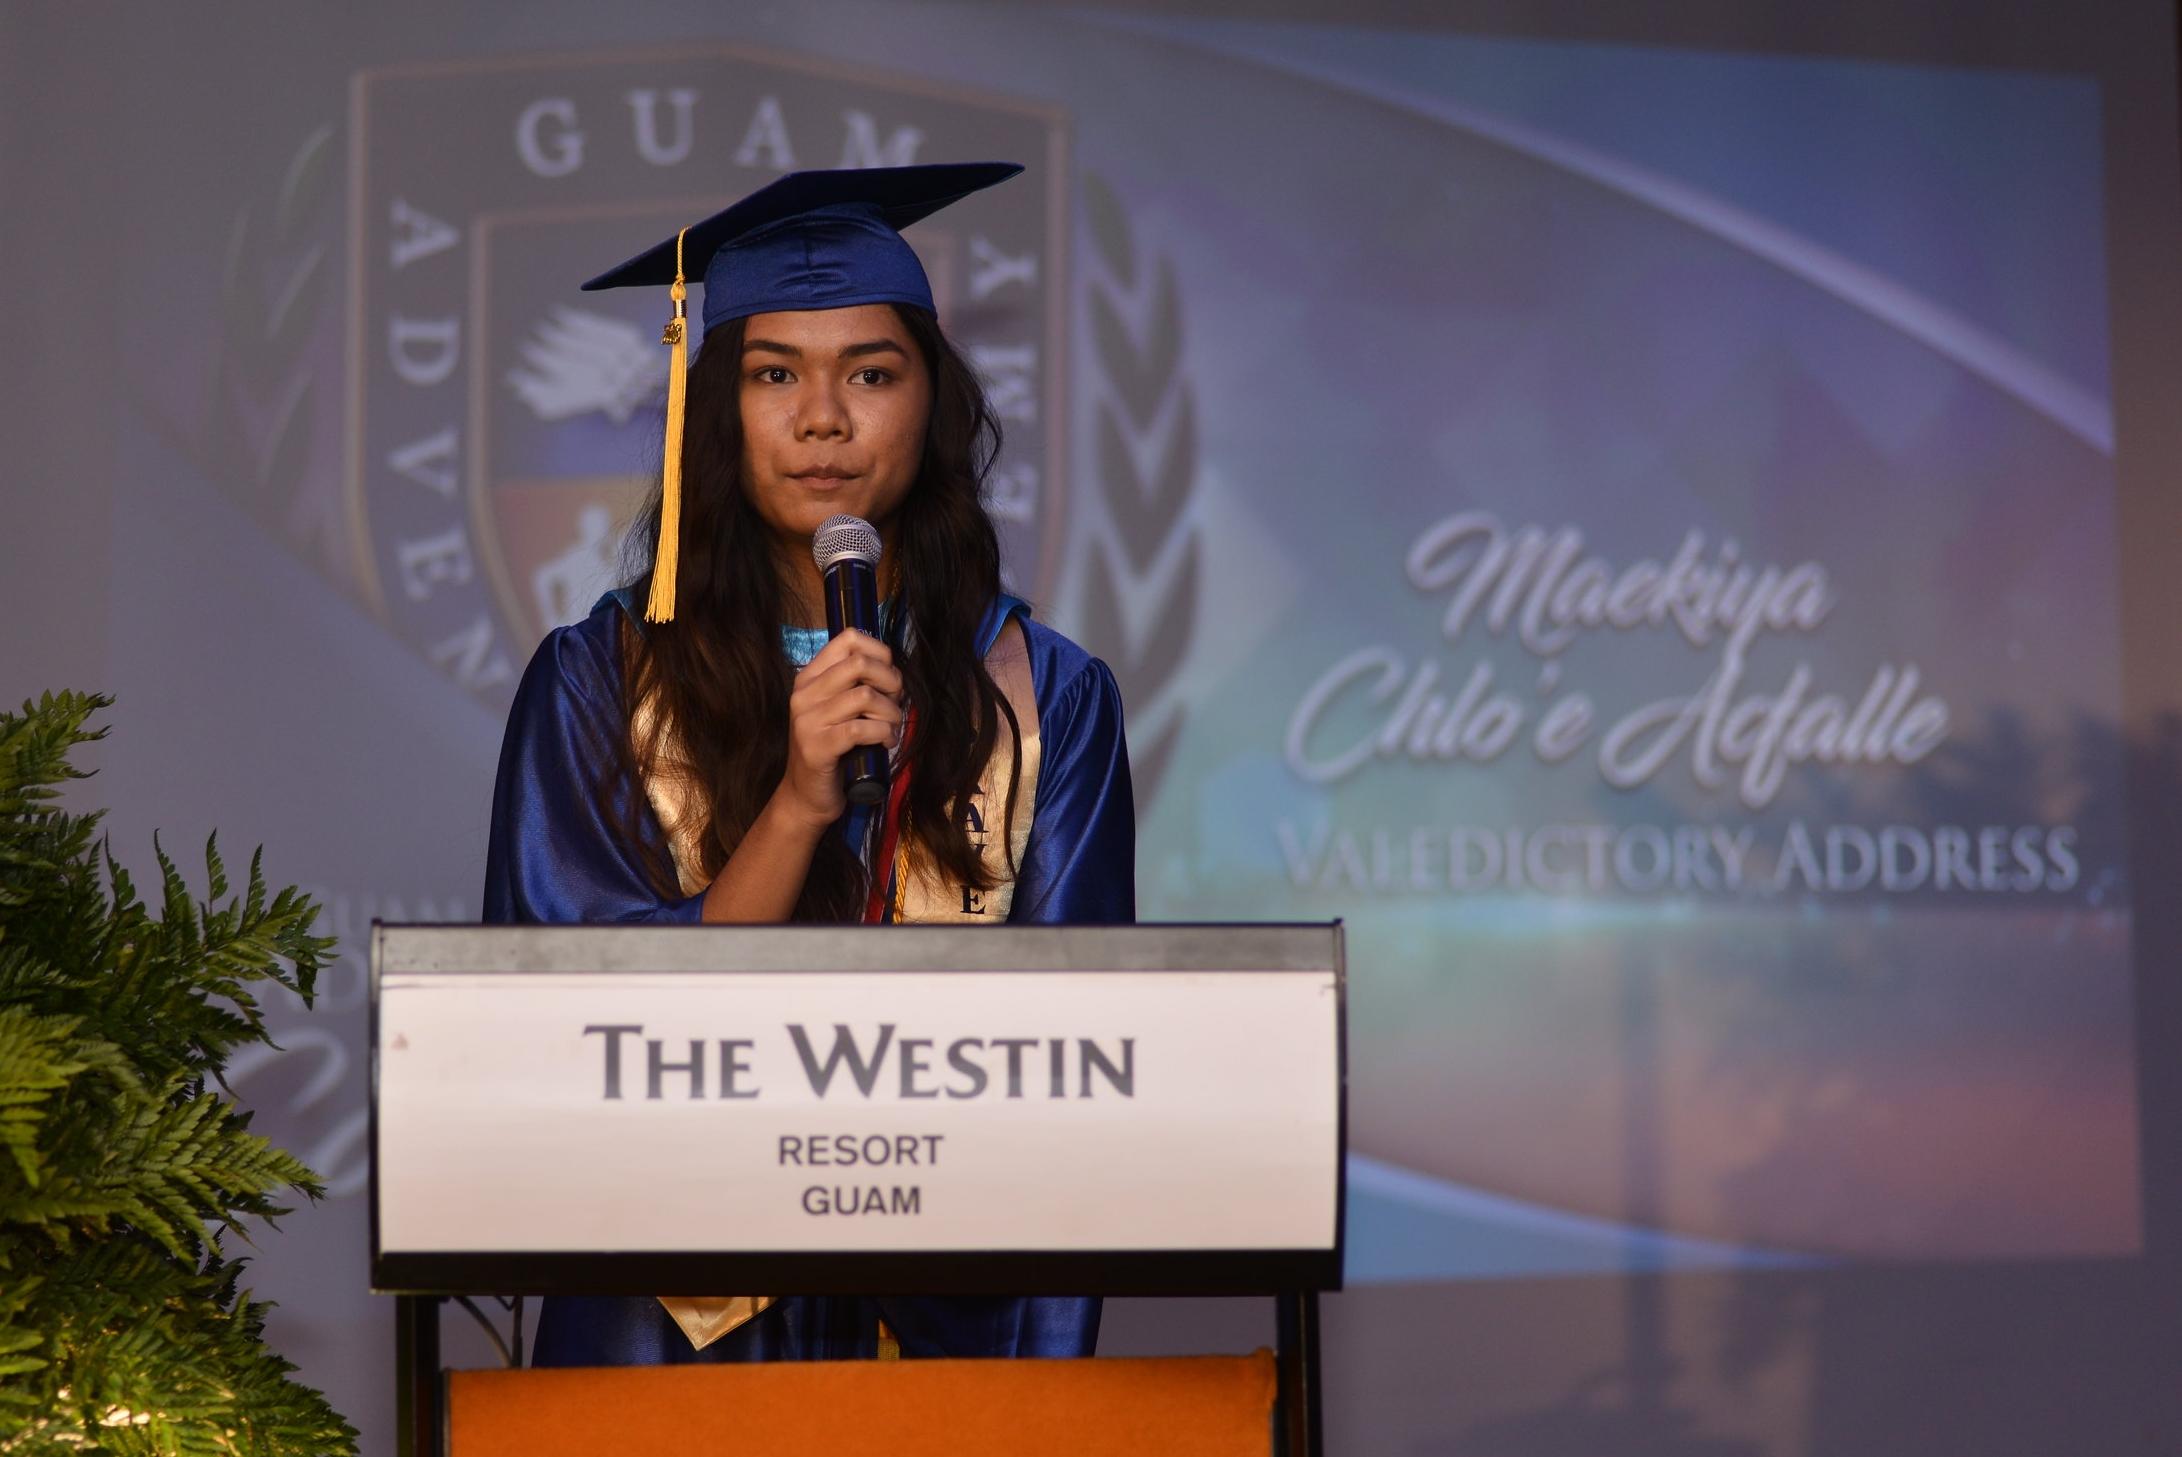 Valedictorian Maekiya Acfalle shares her valedictory message during the graduation ceremony.